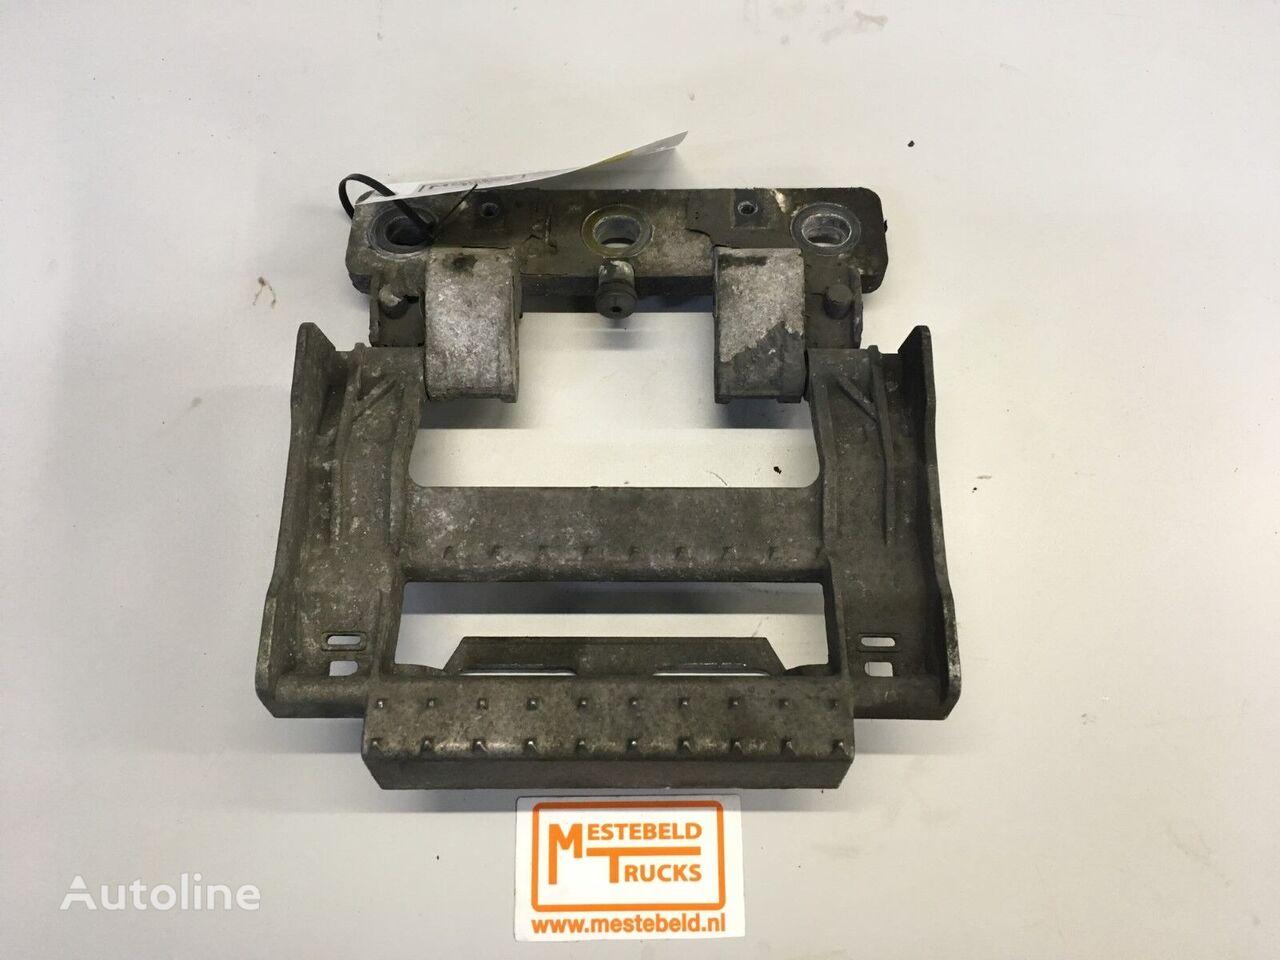 облицовка DAF Opstaptrede in grille для грузовика DAF XF95/XF105